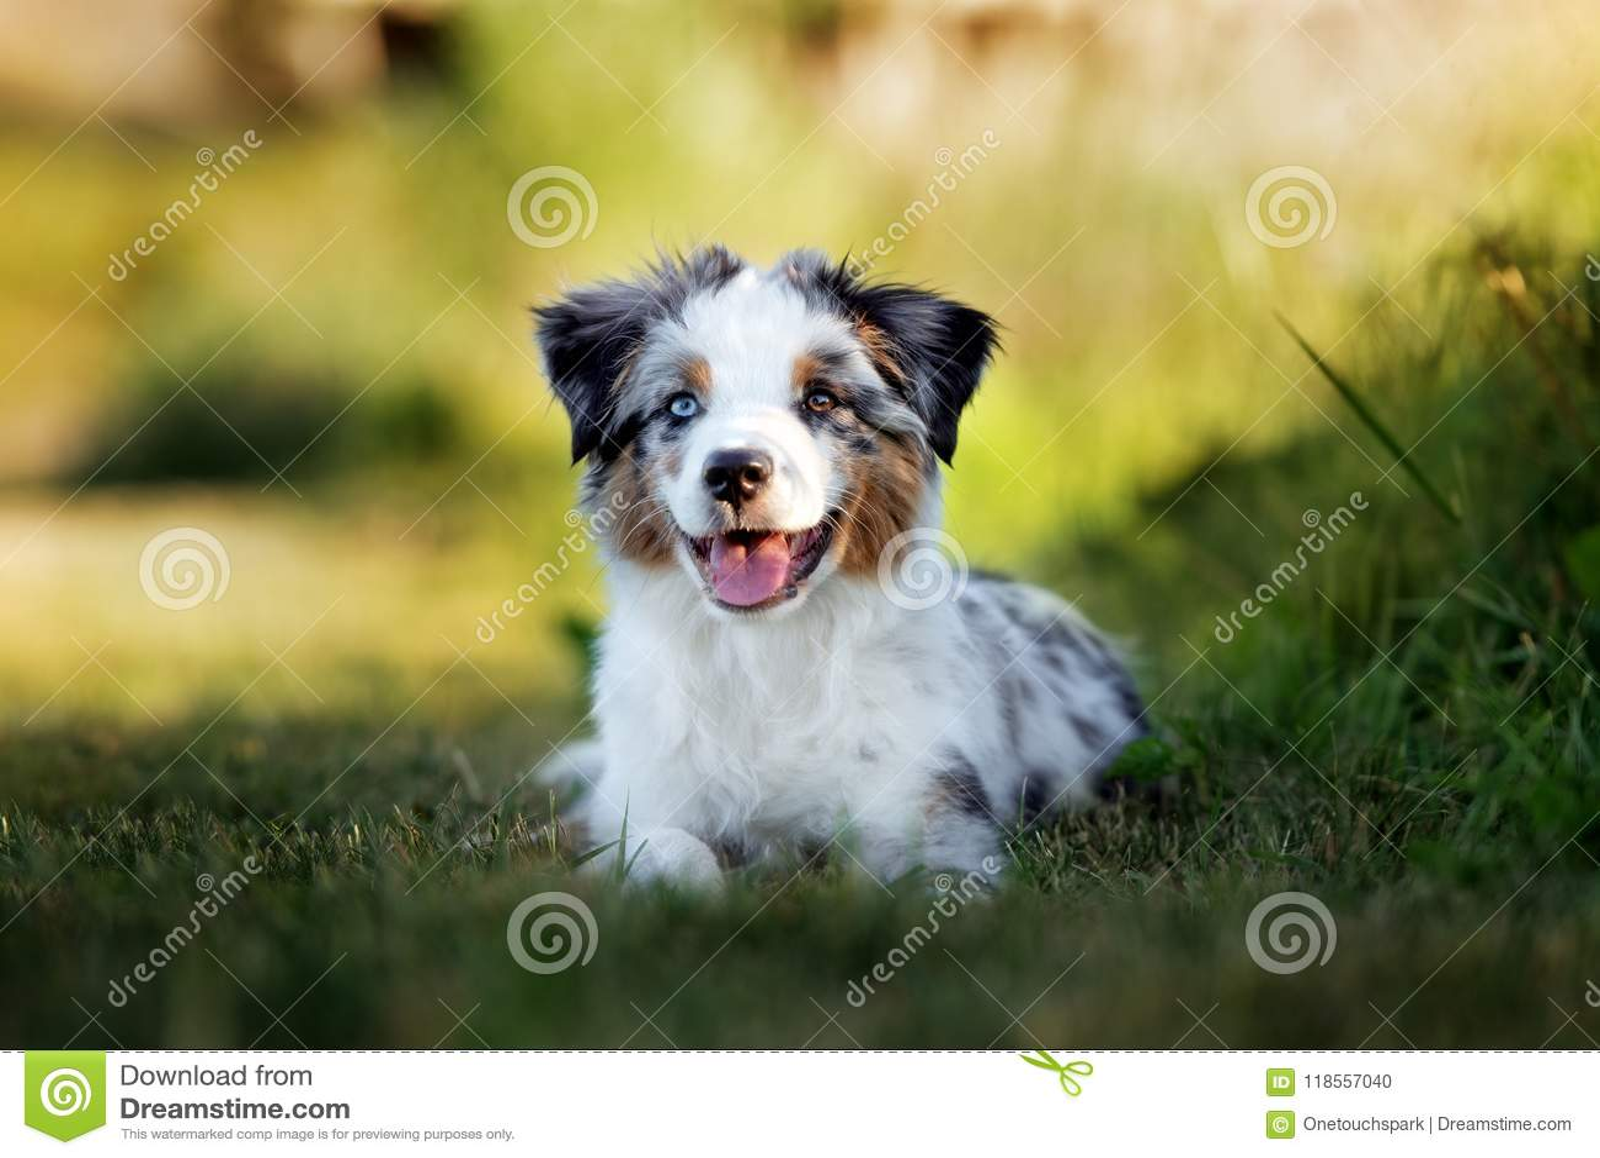 Miniature Australian Shepherd Puppy Outdoors In Summer Stock Photo Image Of Resting Aussie 118557040